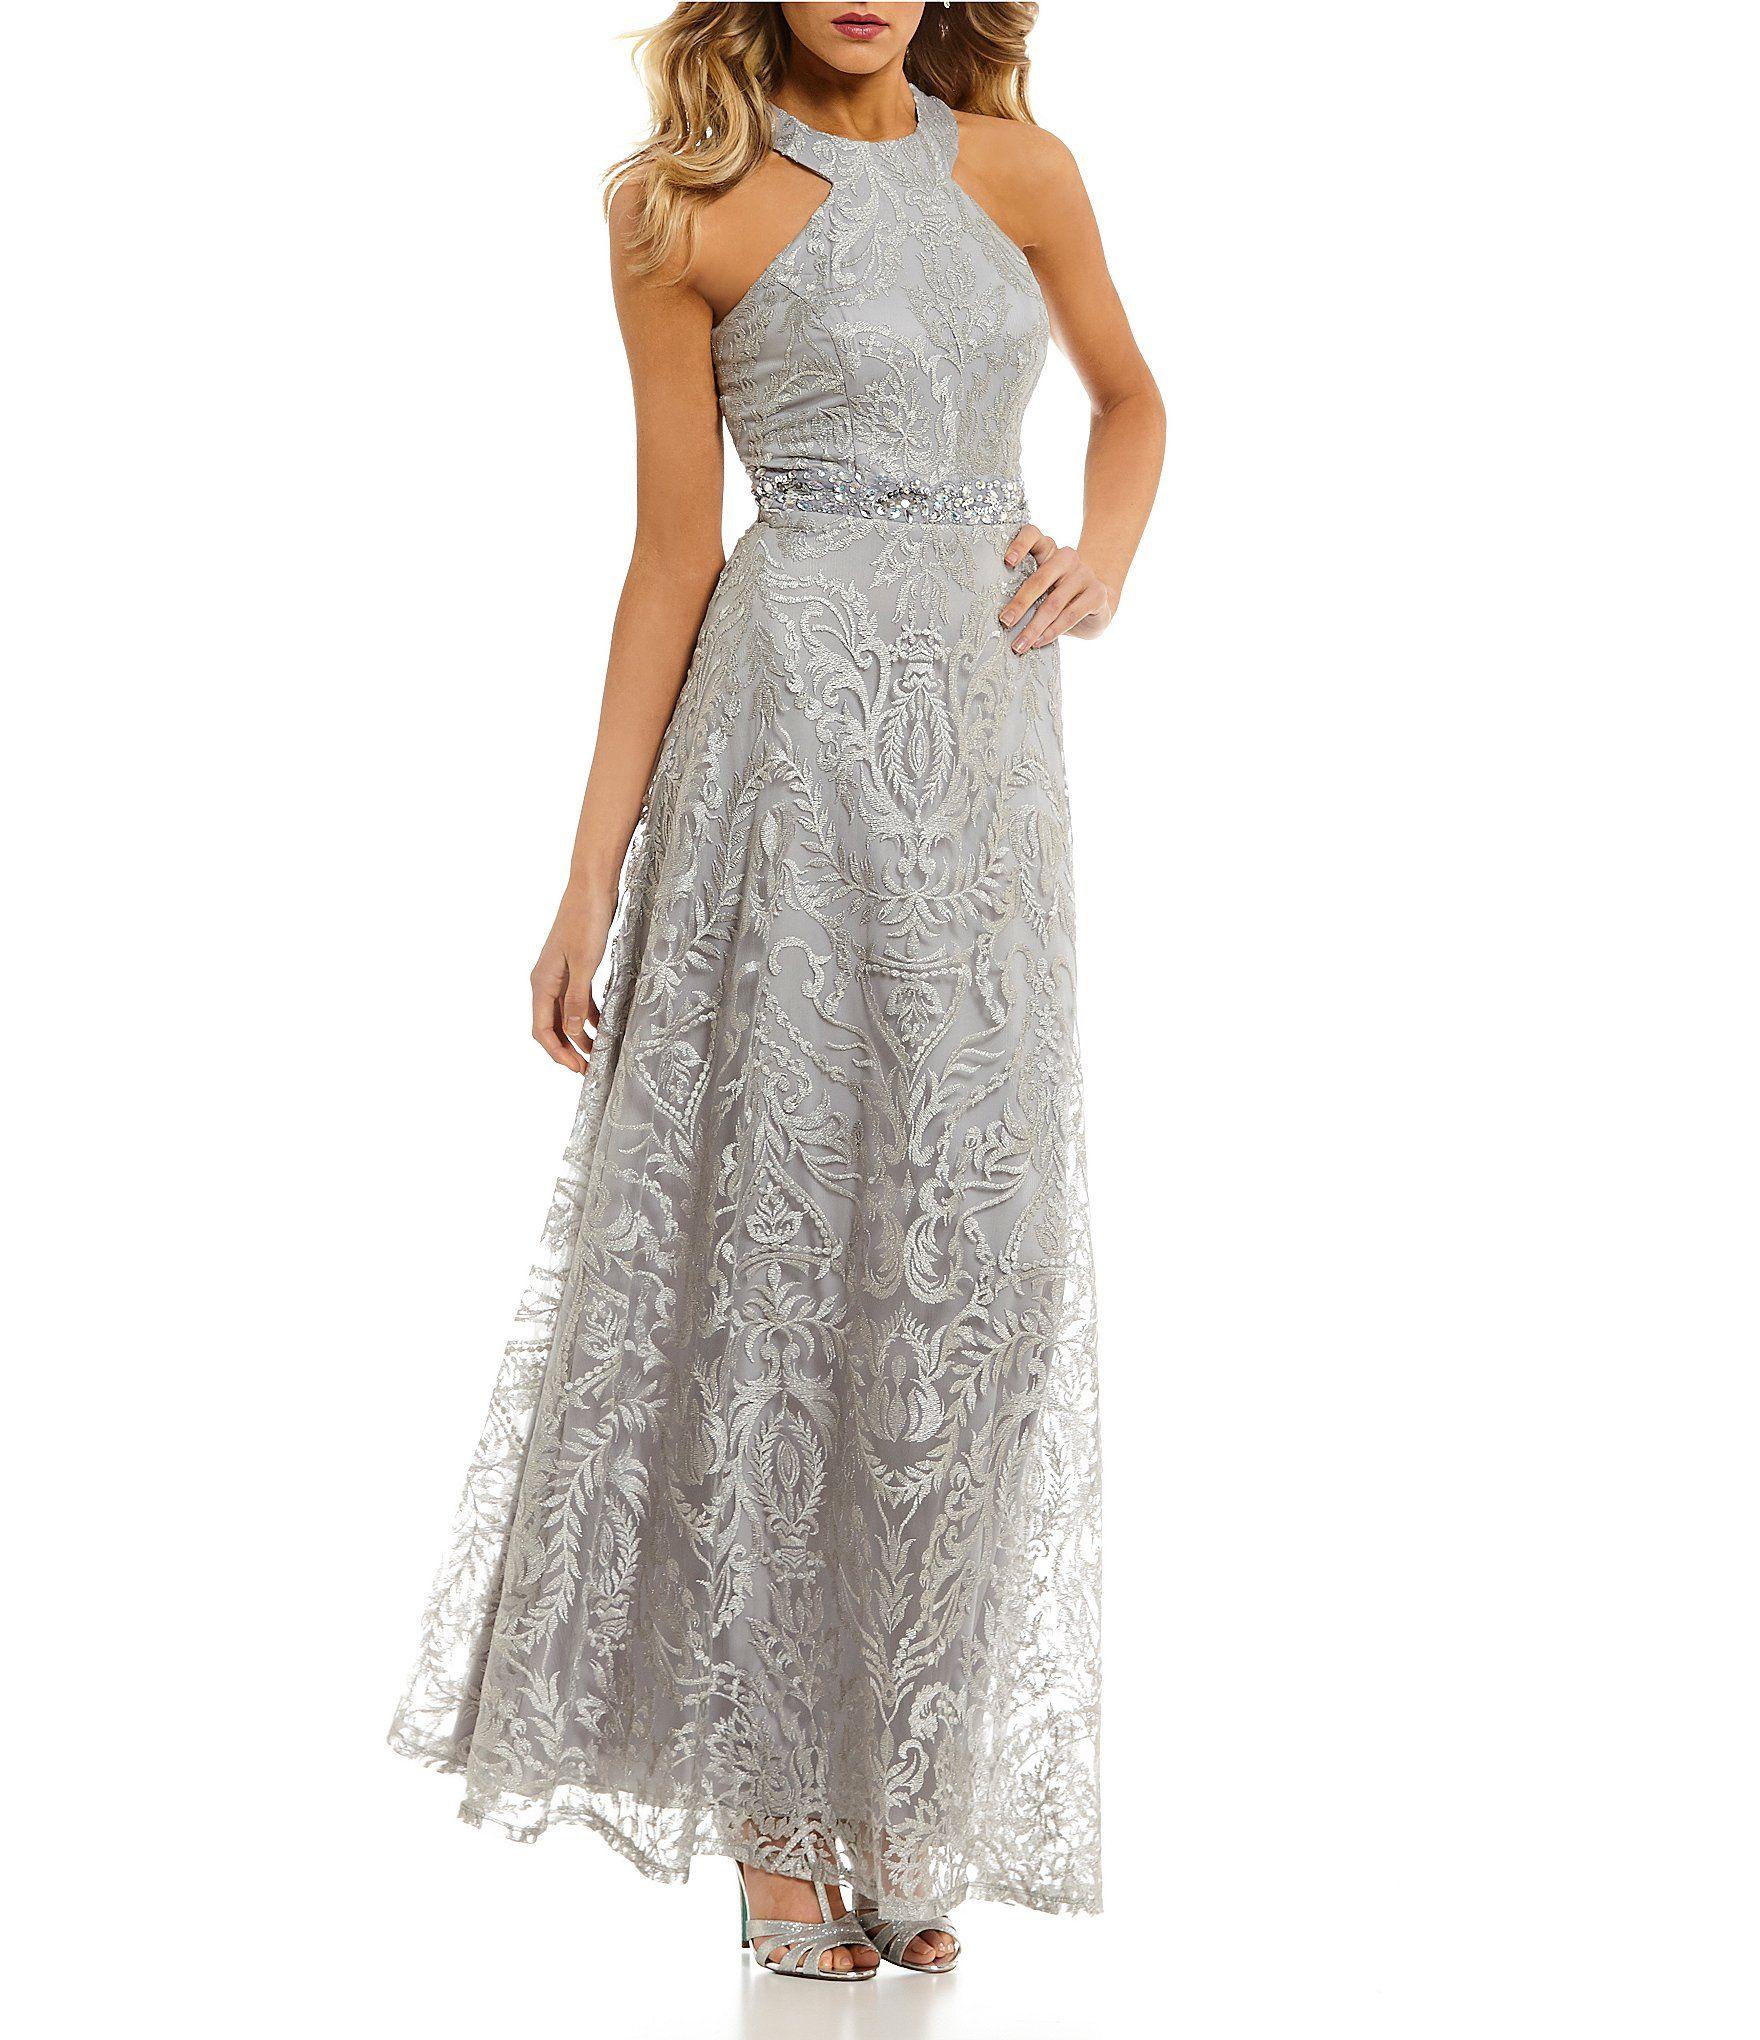 Wedding dresses dillards  Xtraordinary Racer Neckline Embroidered Long Dress  Dillards